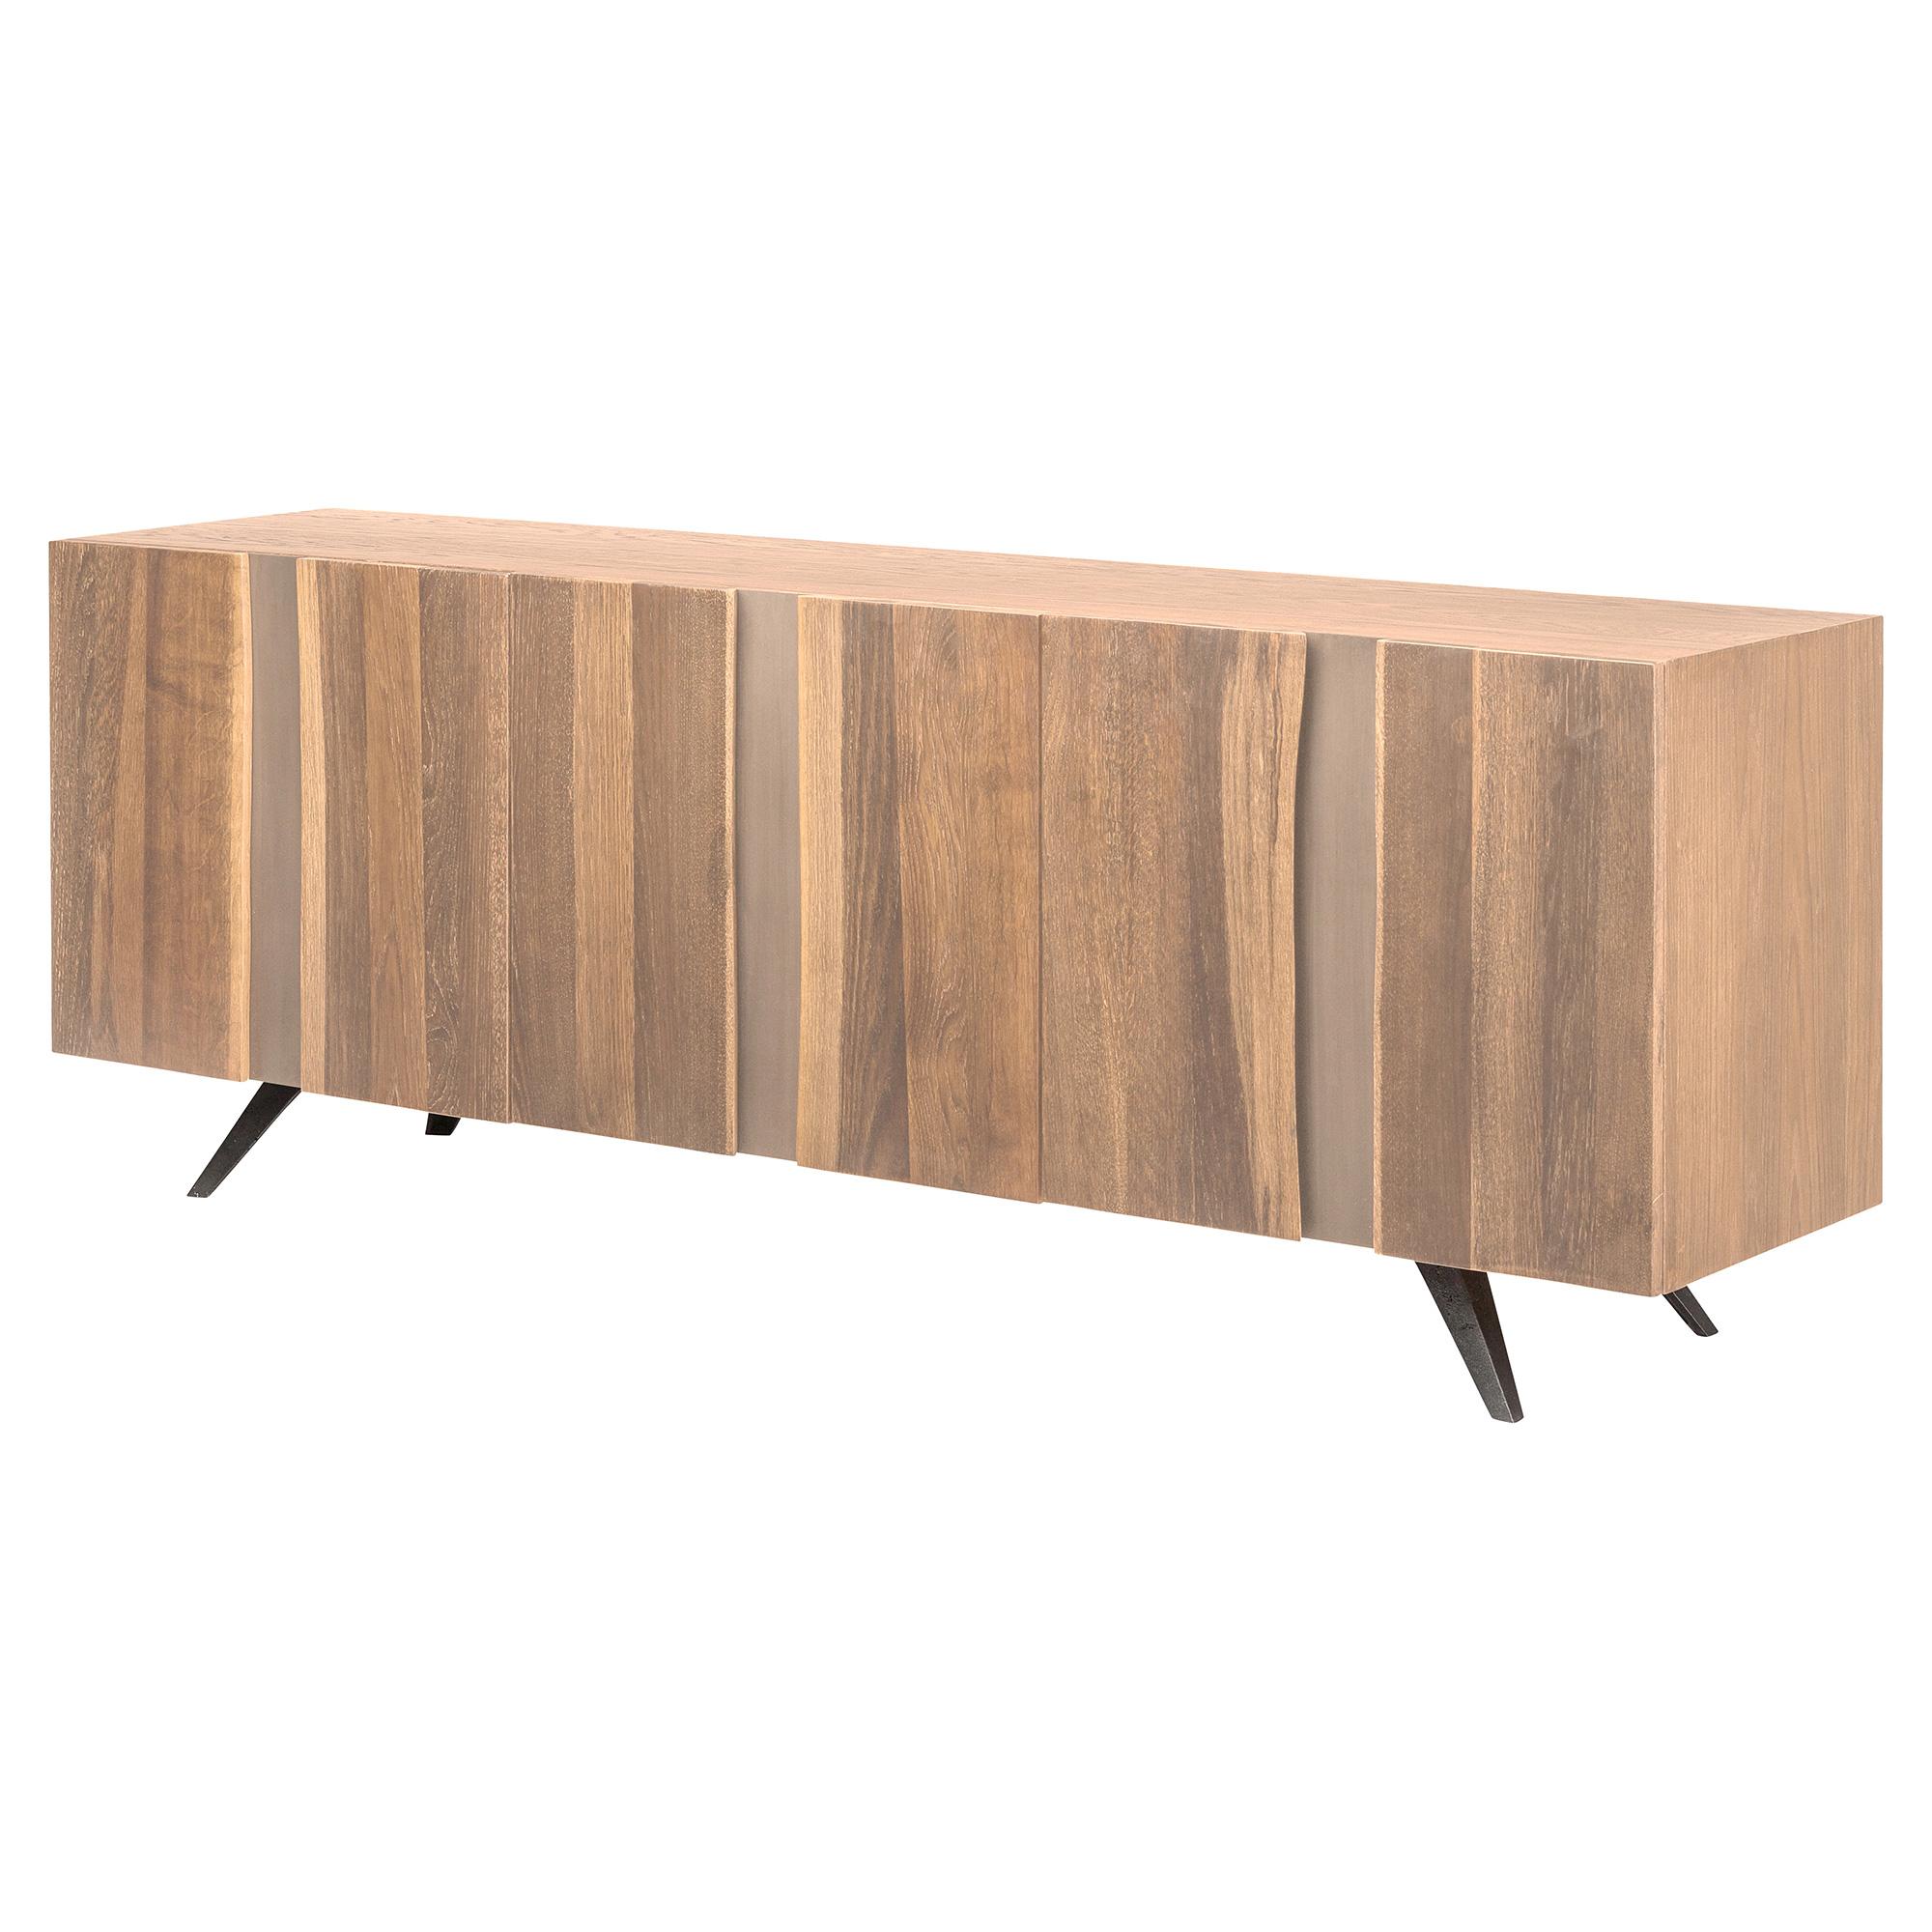 Raine Rustic Vertical Stria Raw Wood Sideboard Buffet - 78.75W